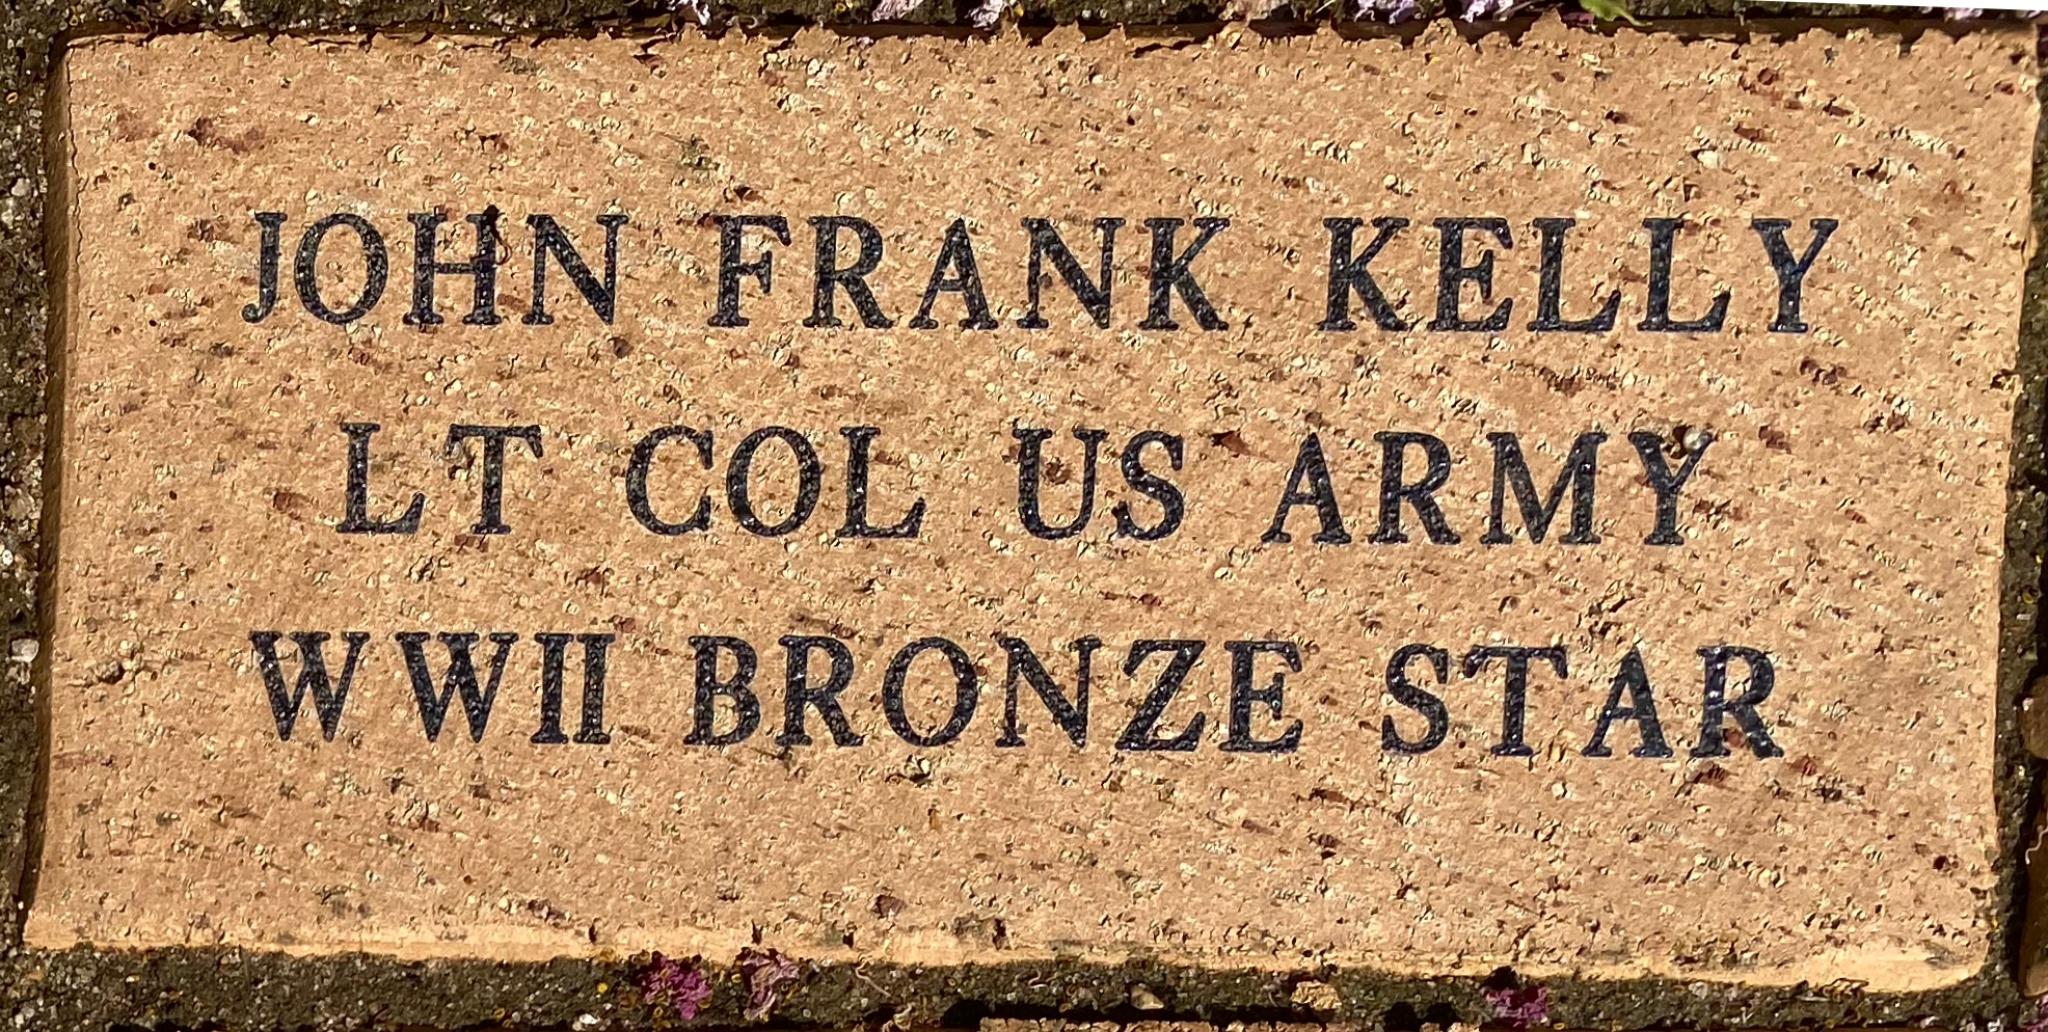 JOHN FRANK KELLY LT COL US ARMY WWII BRONZE STAR